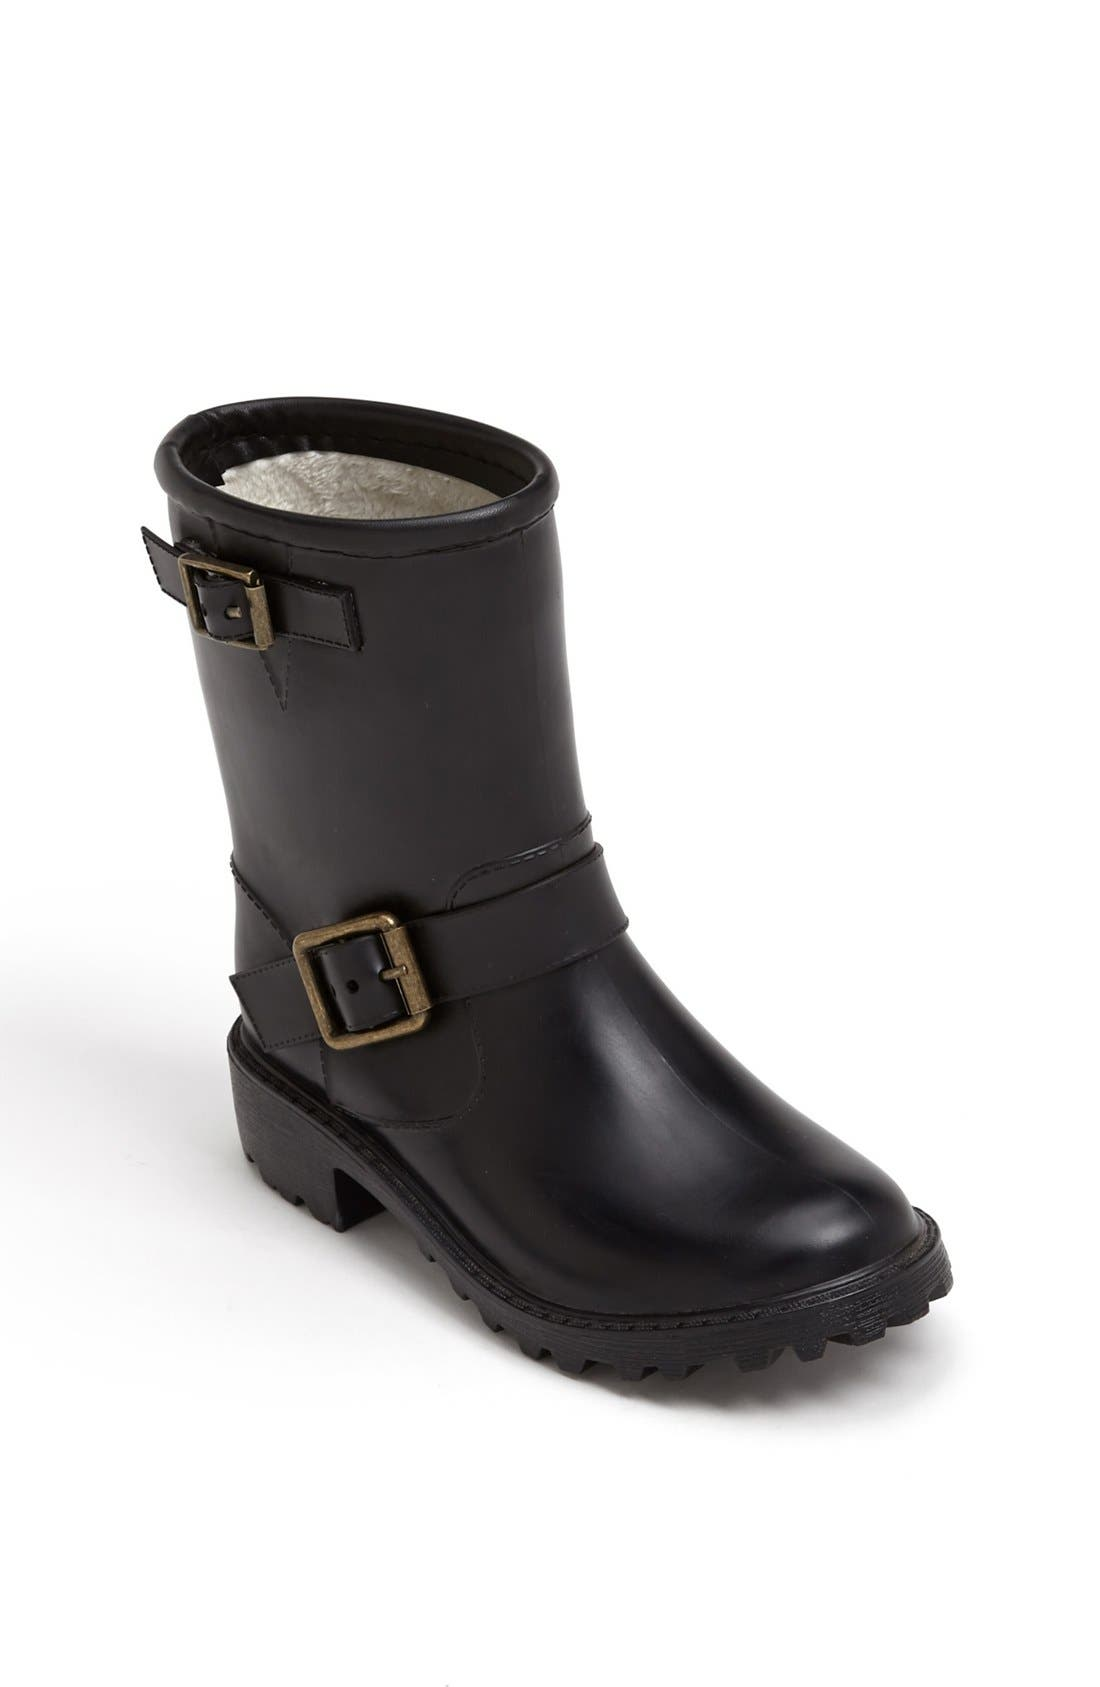 Alternate Image 1 Selected - däv 'Liverpool' Moto Rain Boot (Toddler & Little Kid)